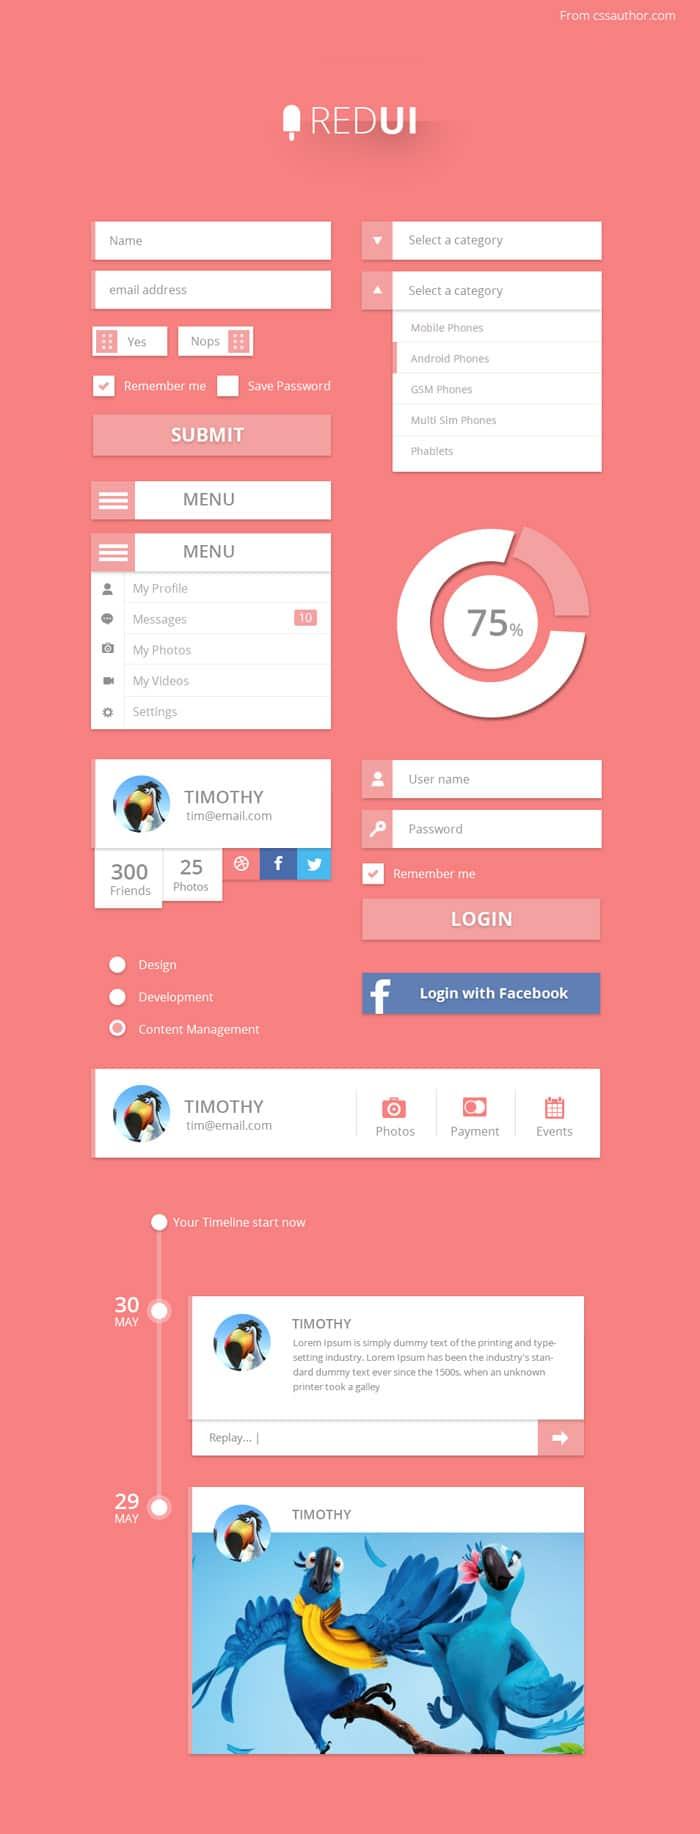 RED UI – User Interface Design Kit PSD